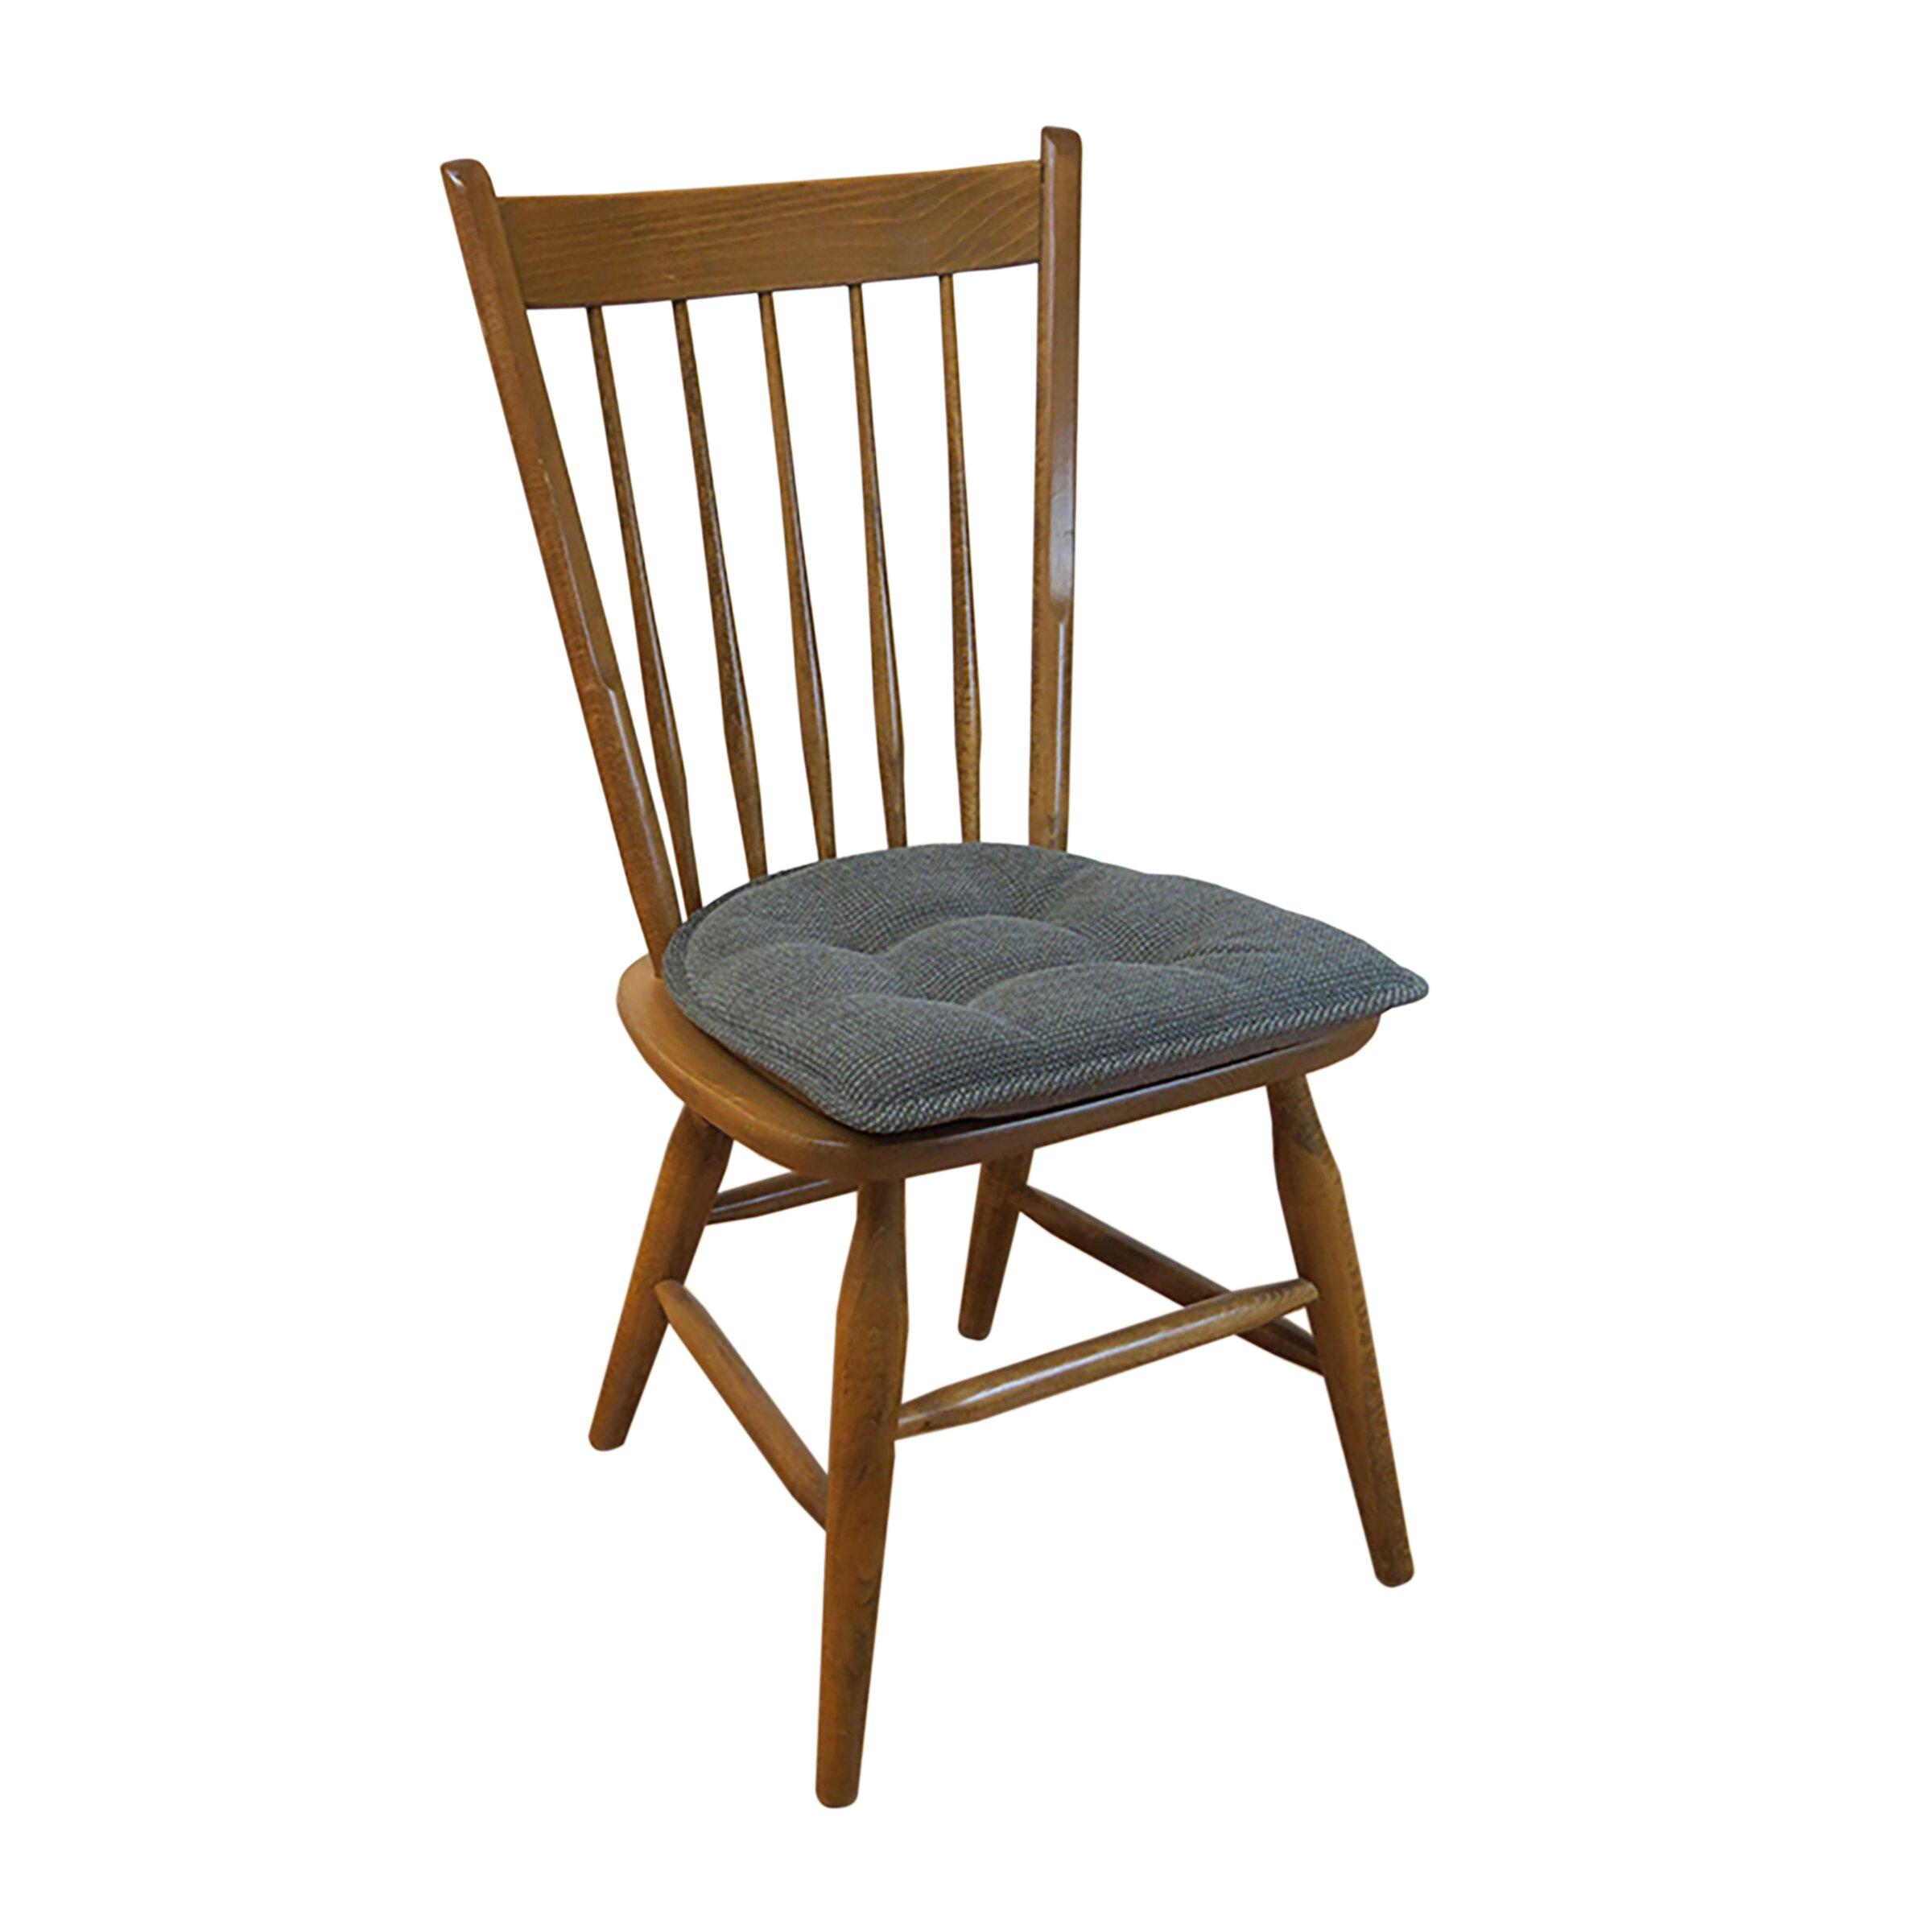 Klear Vu Thatcher Gripper Tufted Chair Cushion amp Reviews  : Klear Vu Thatcher Gripper Tufted Chair Cushion 414145 from www.wayfair.com size 2400 x 2400 jpeg 314kB